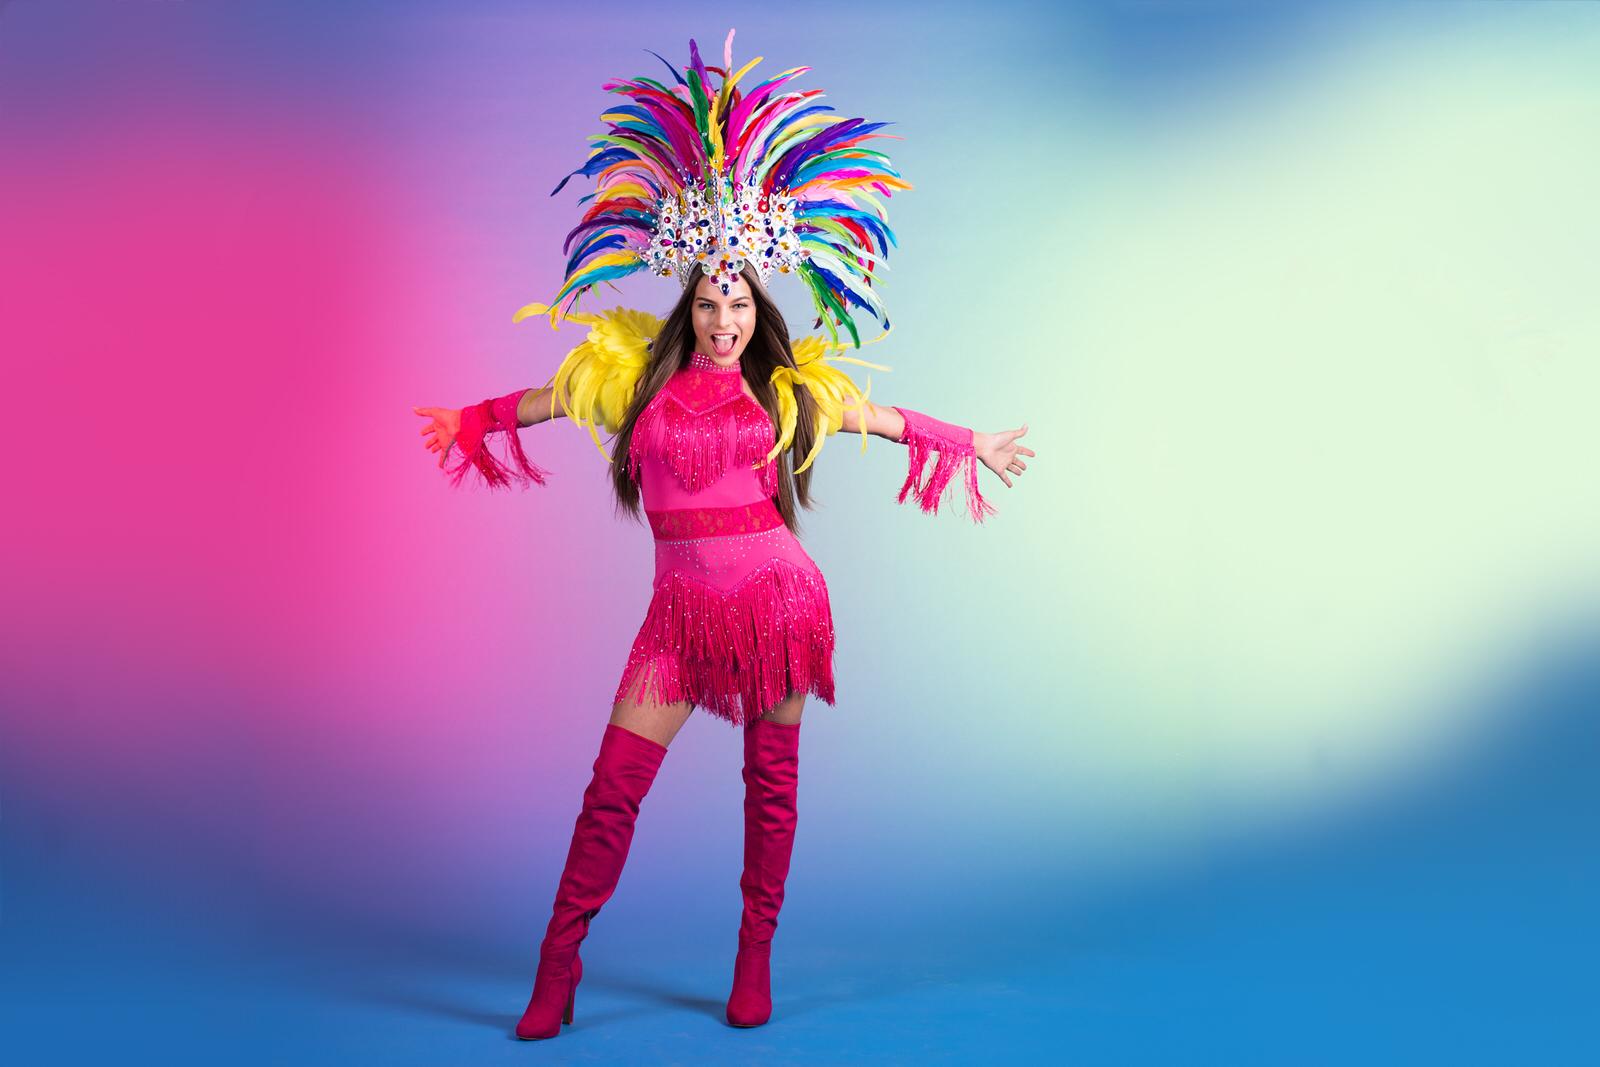 latin, salsa, dans, rio, carnaval, opzwepende dans, beweging, roze, pink lady, feathers